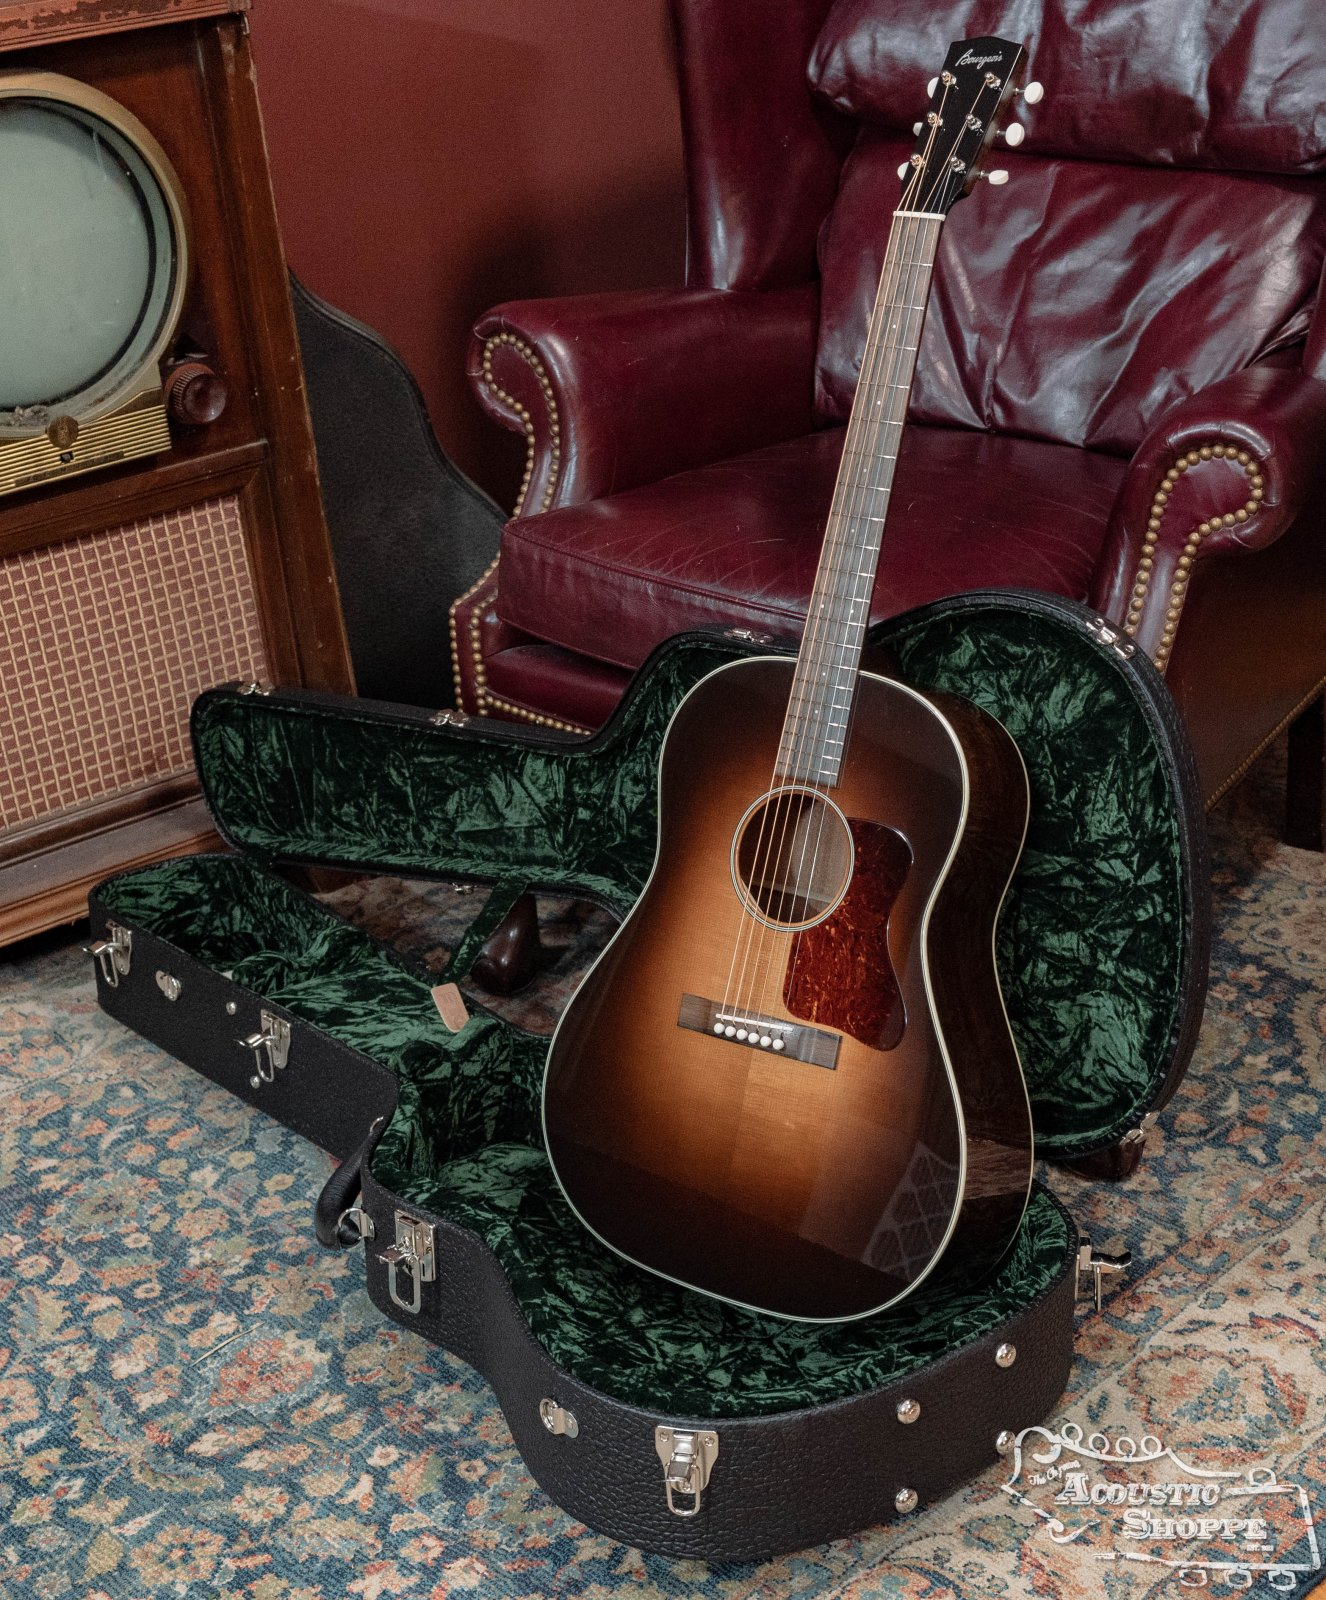 Bourgeois SD Standard Heirloom Series Aged Tone Adirondack/Mahogany #9162